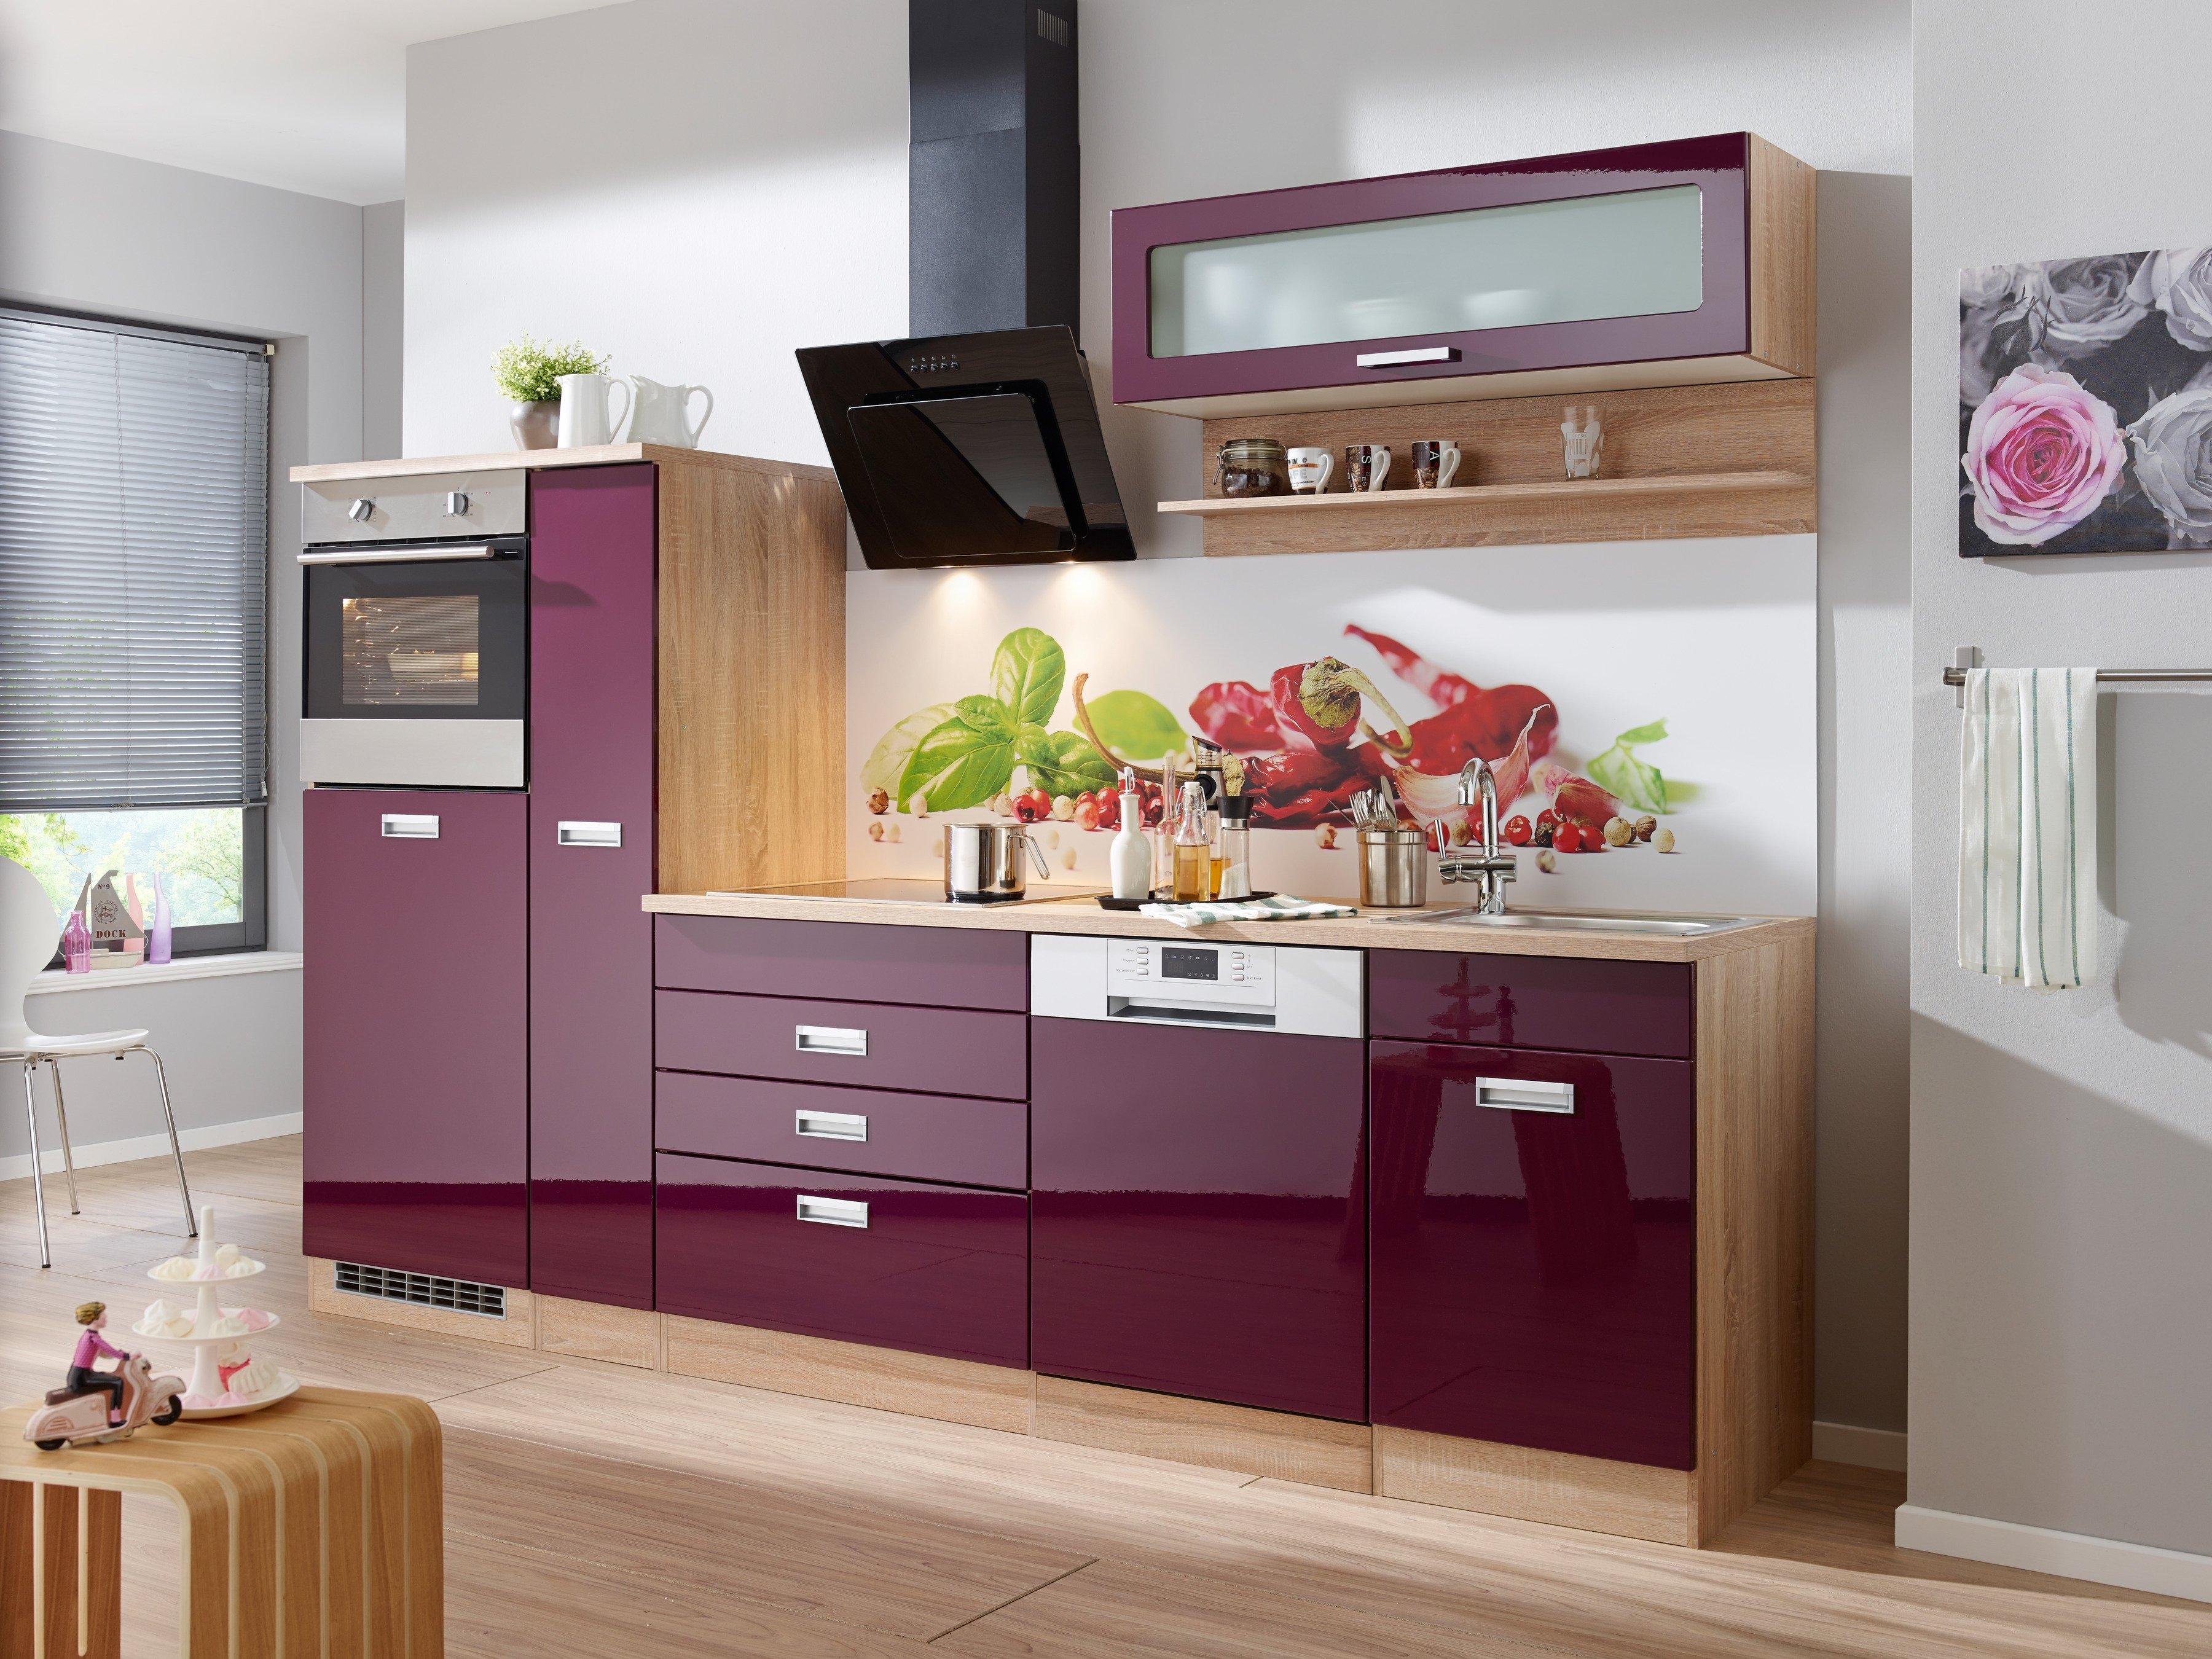 Keukenblokken zonder elektra online shop nu online kopen for Single kuchenzeile mit elektrogeraten